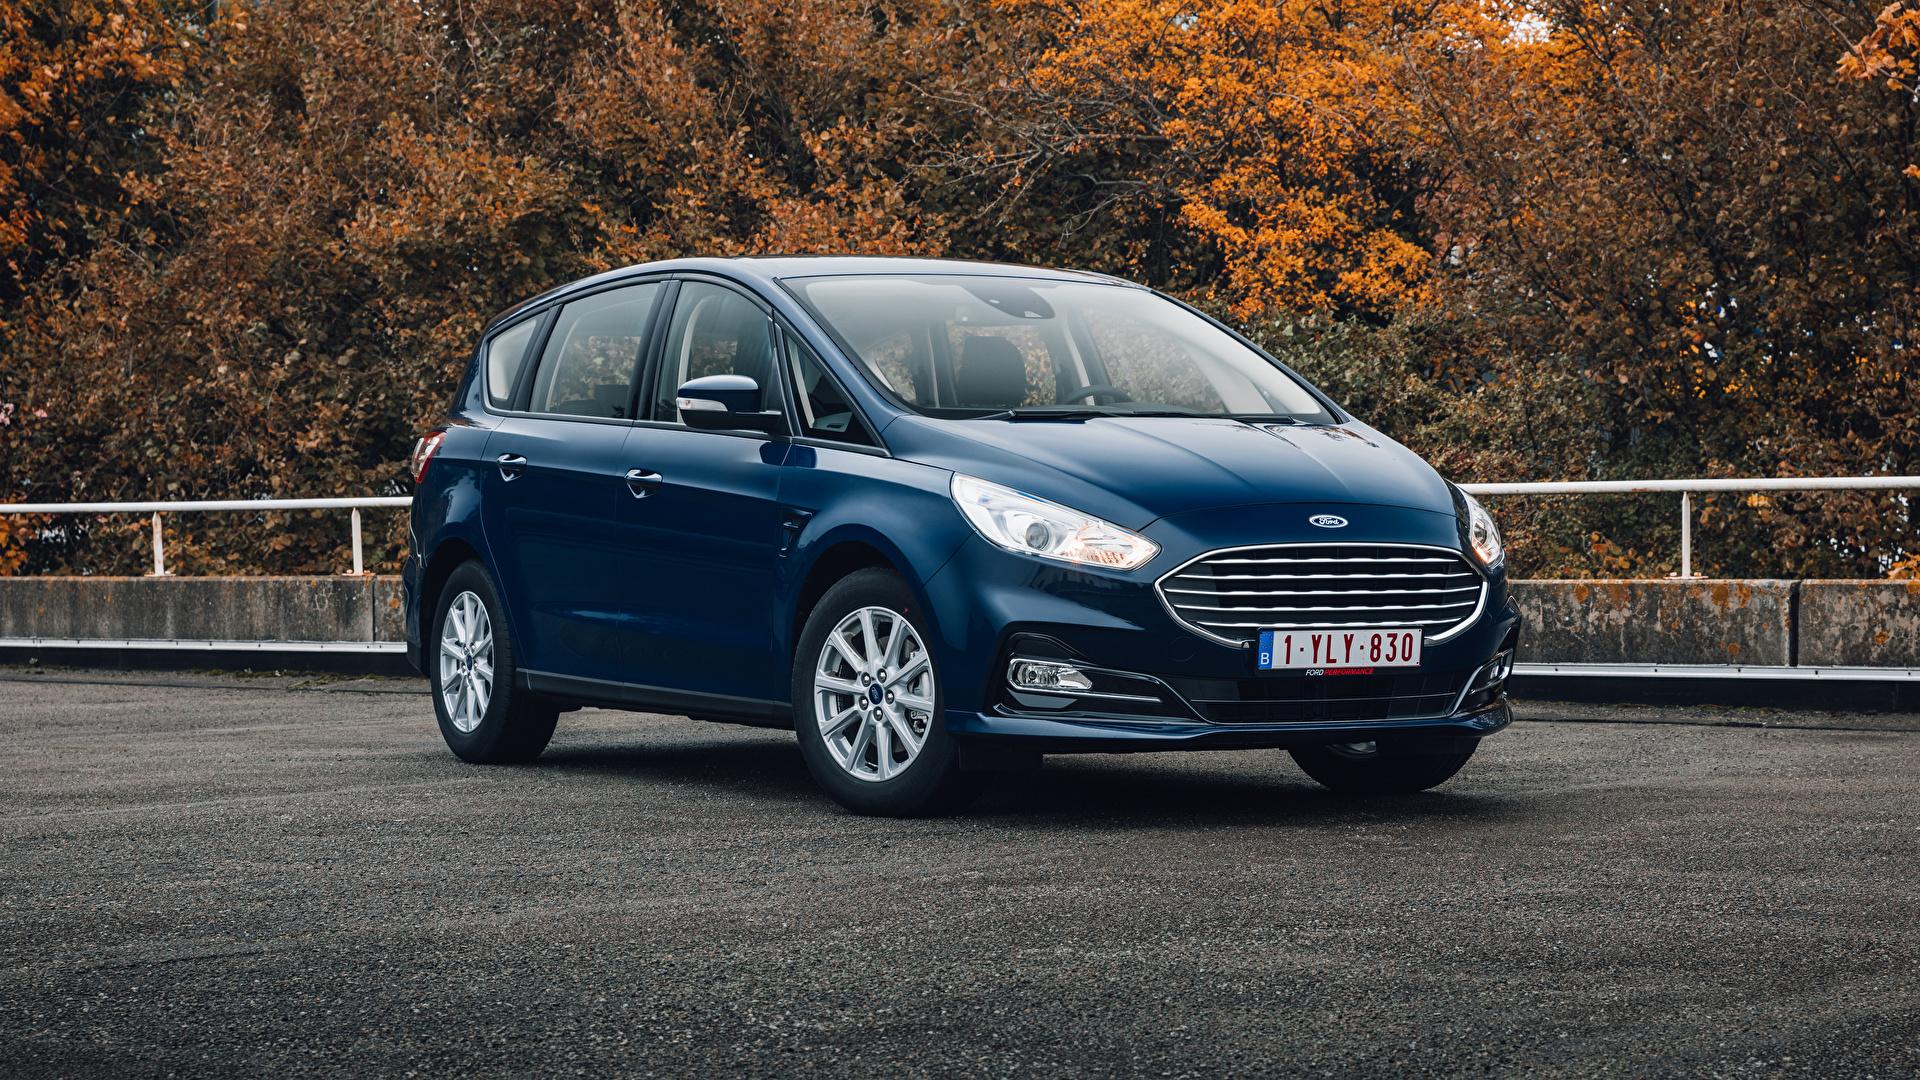 Foto Ford Kombi S-MAX, 2019-- Blau Autos Metallisch 1920x1080 auto automobil